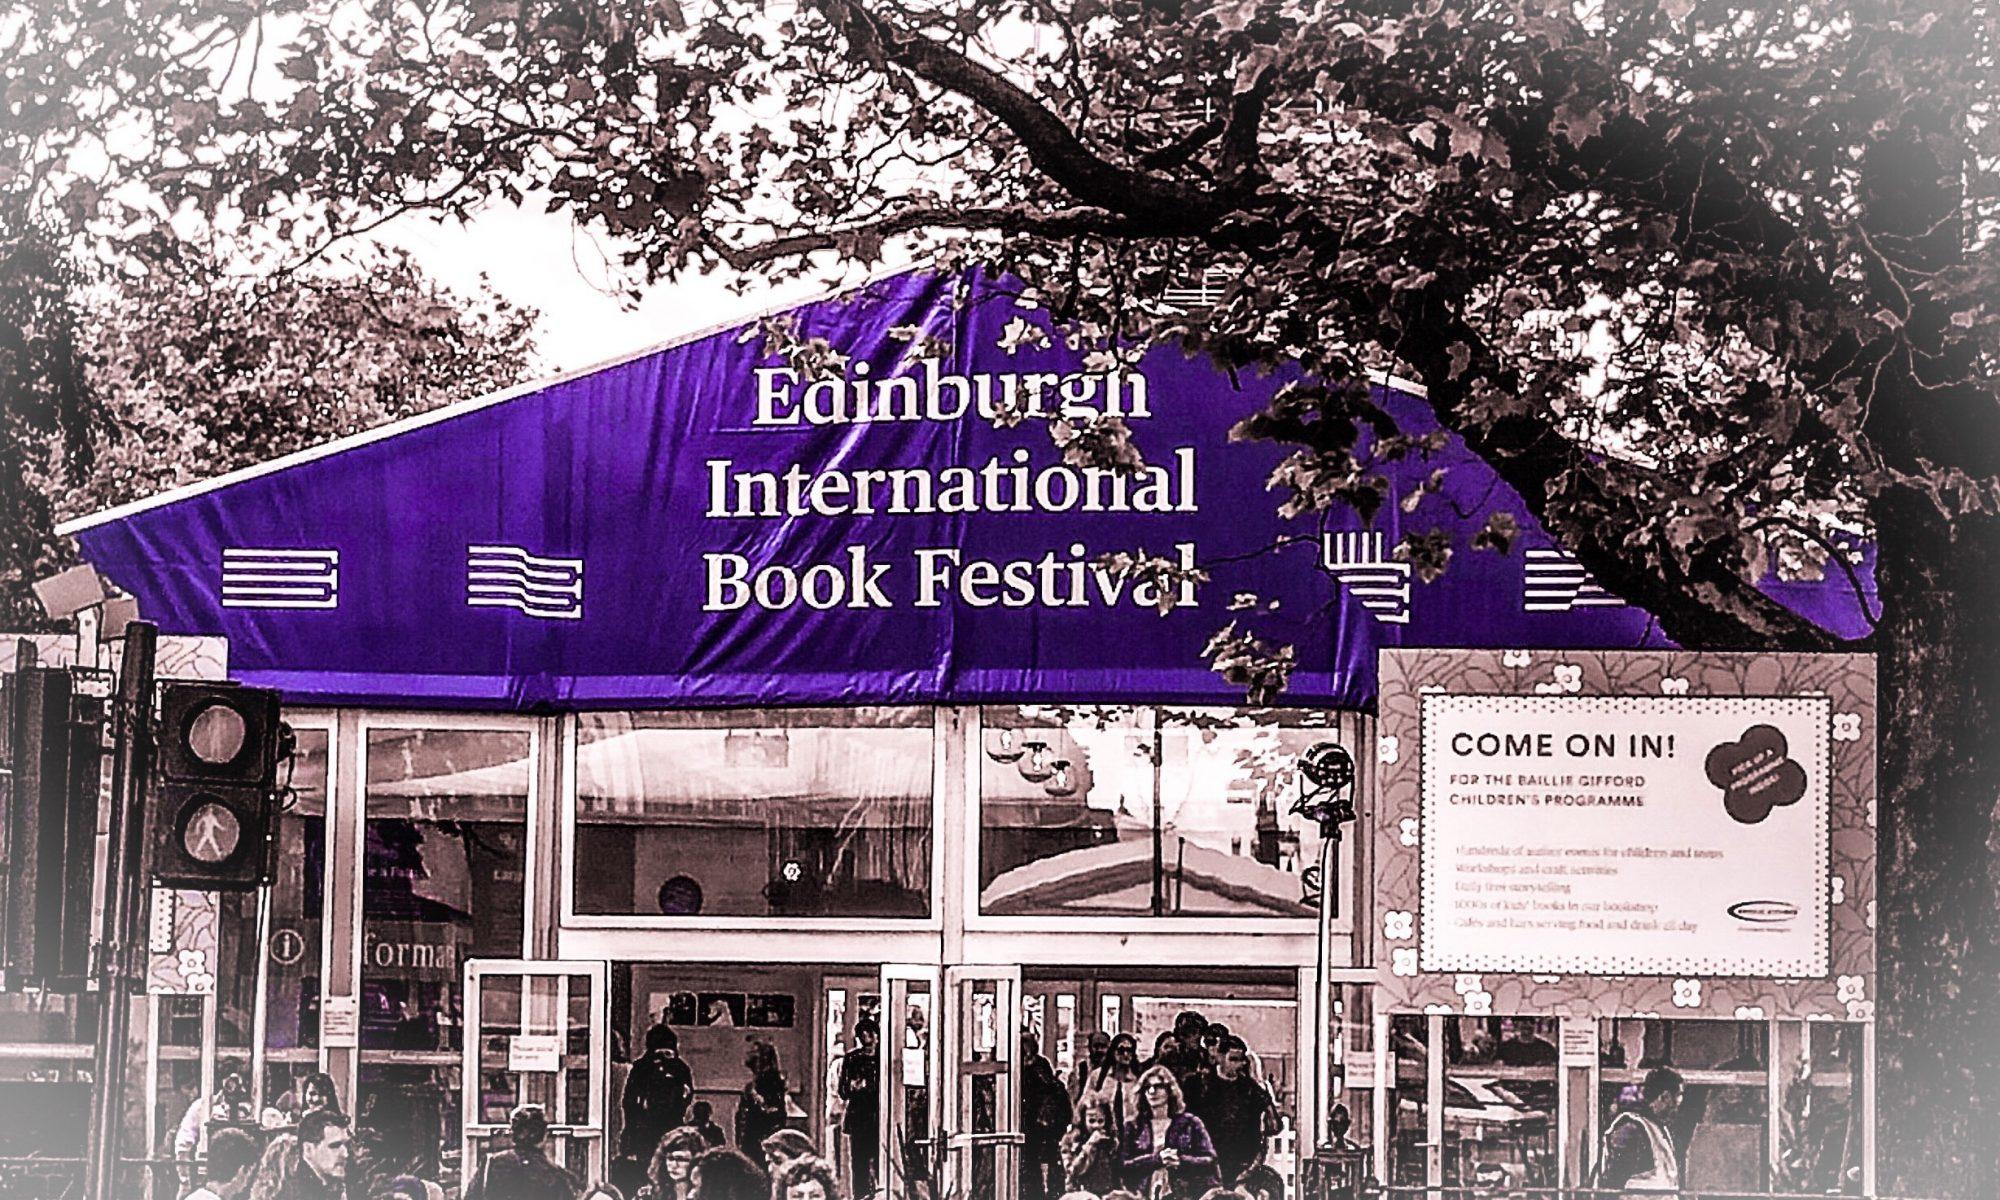 Edinburgh International Book Show 2019 front entrance